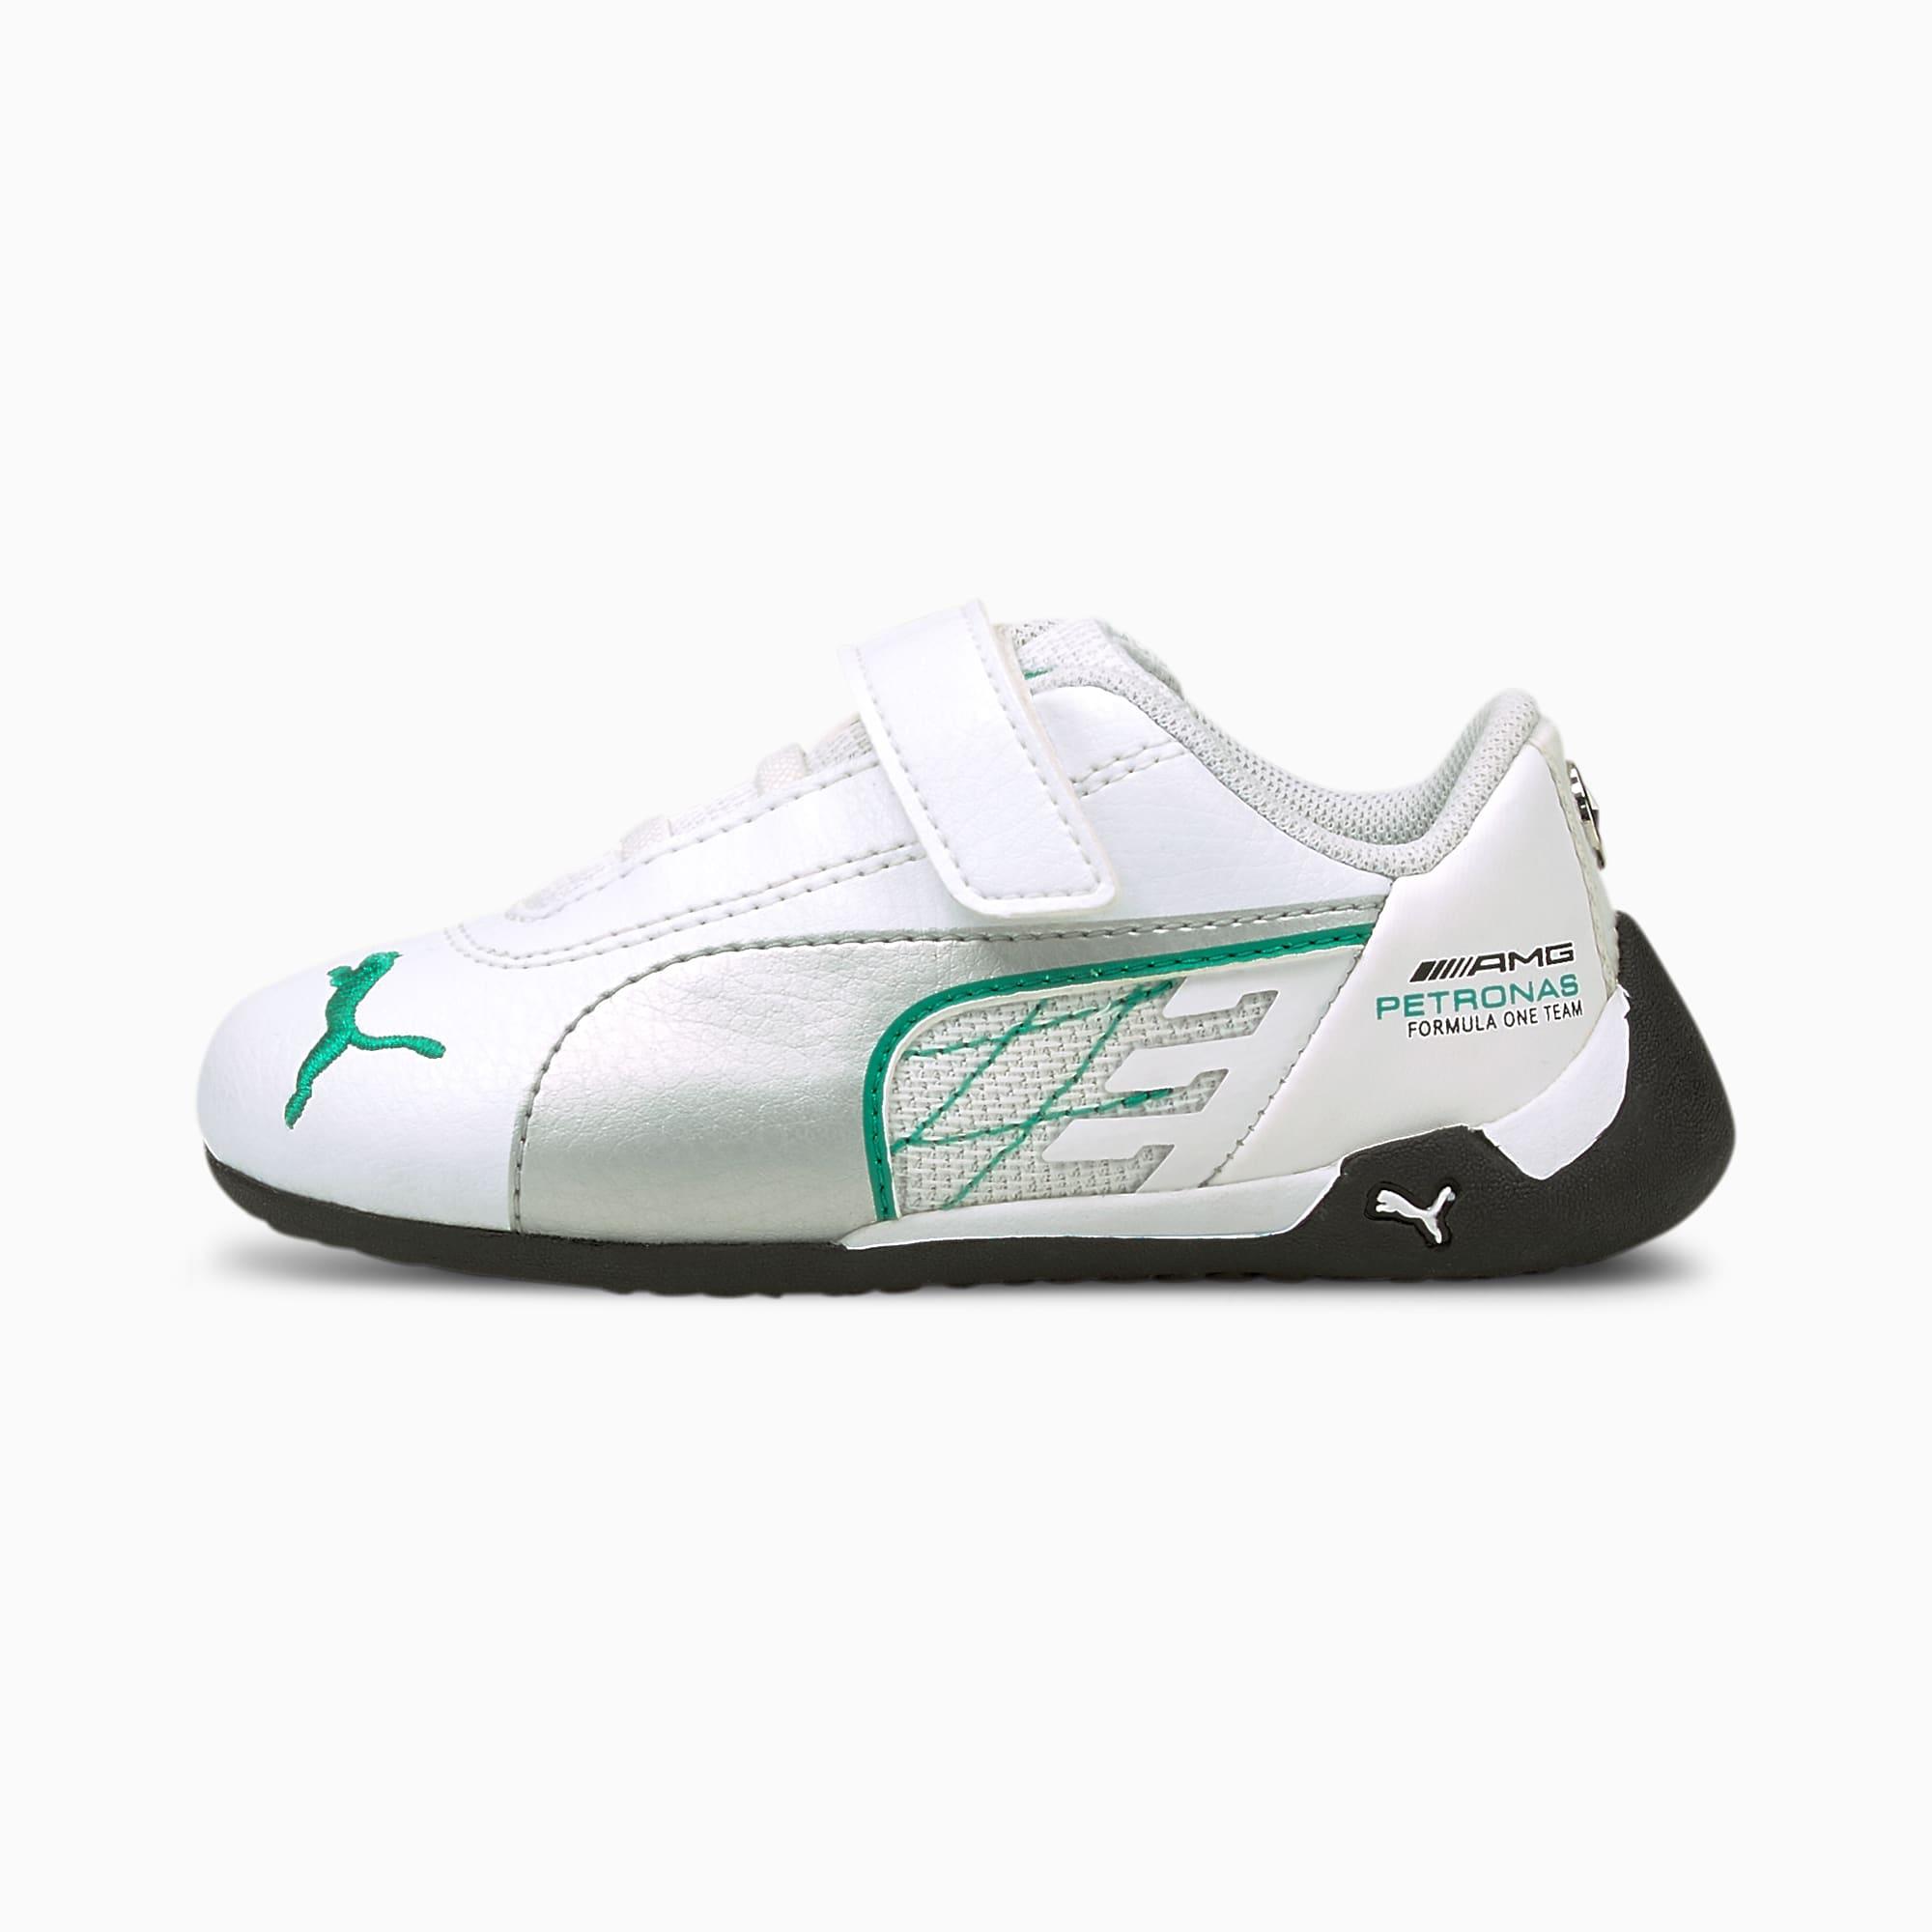 Mercedes-AMG Petronas R-Cat Toddler Motorsport Shoes